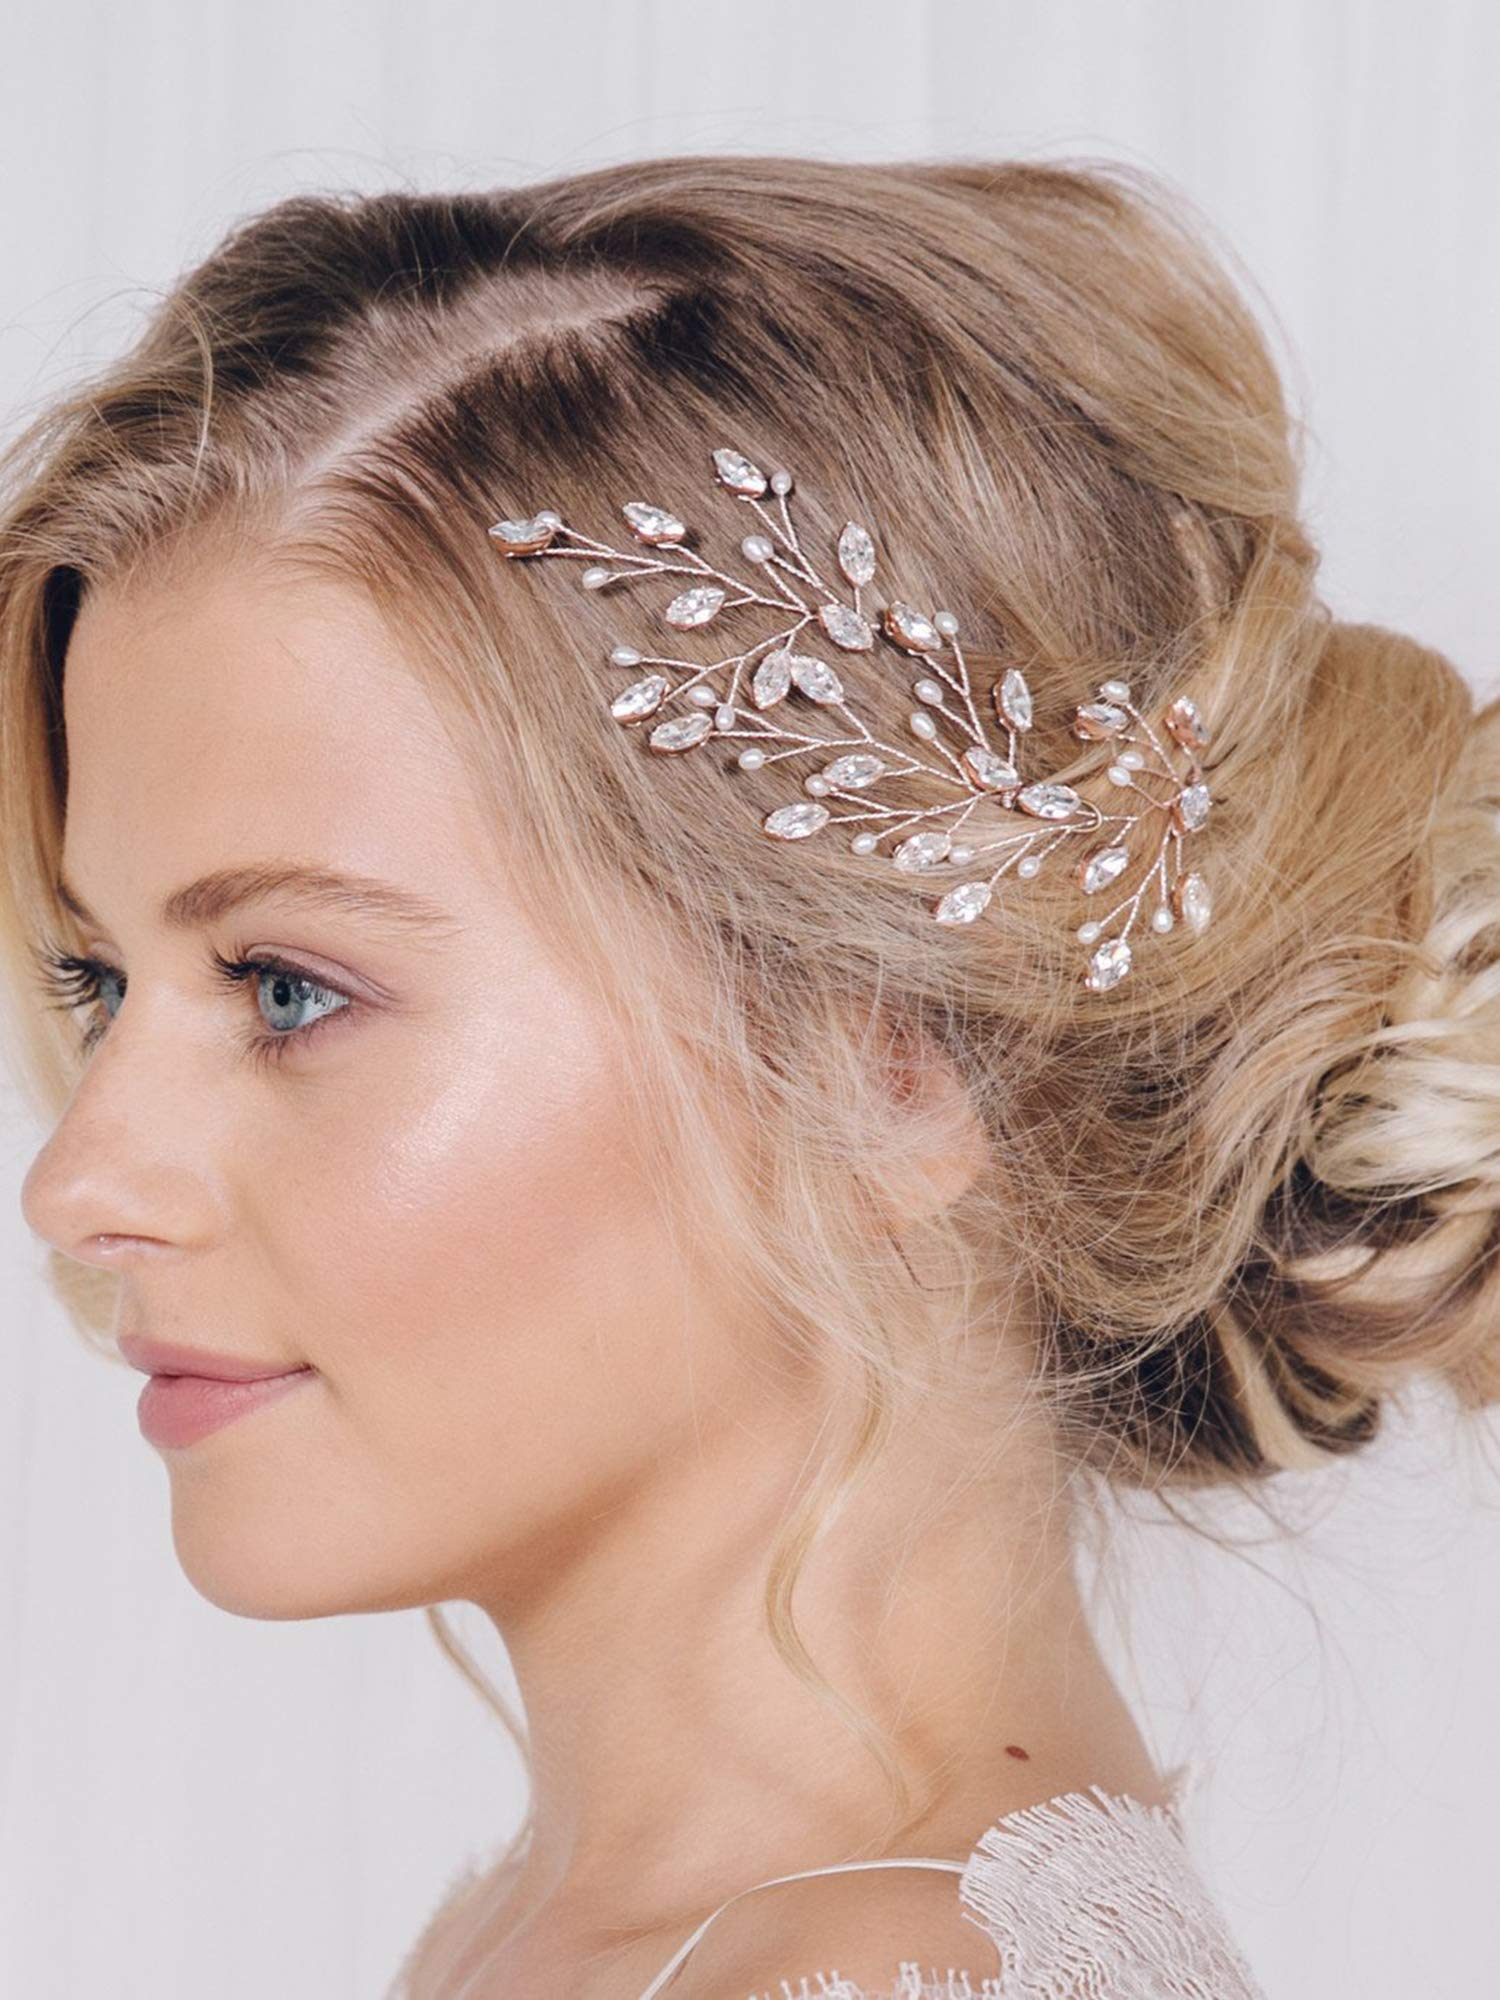 Amazon Fxmimior Bridal Hair Accessories Pearl Crystal Hair